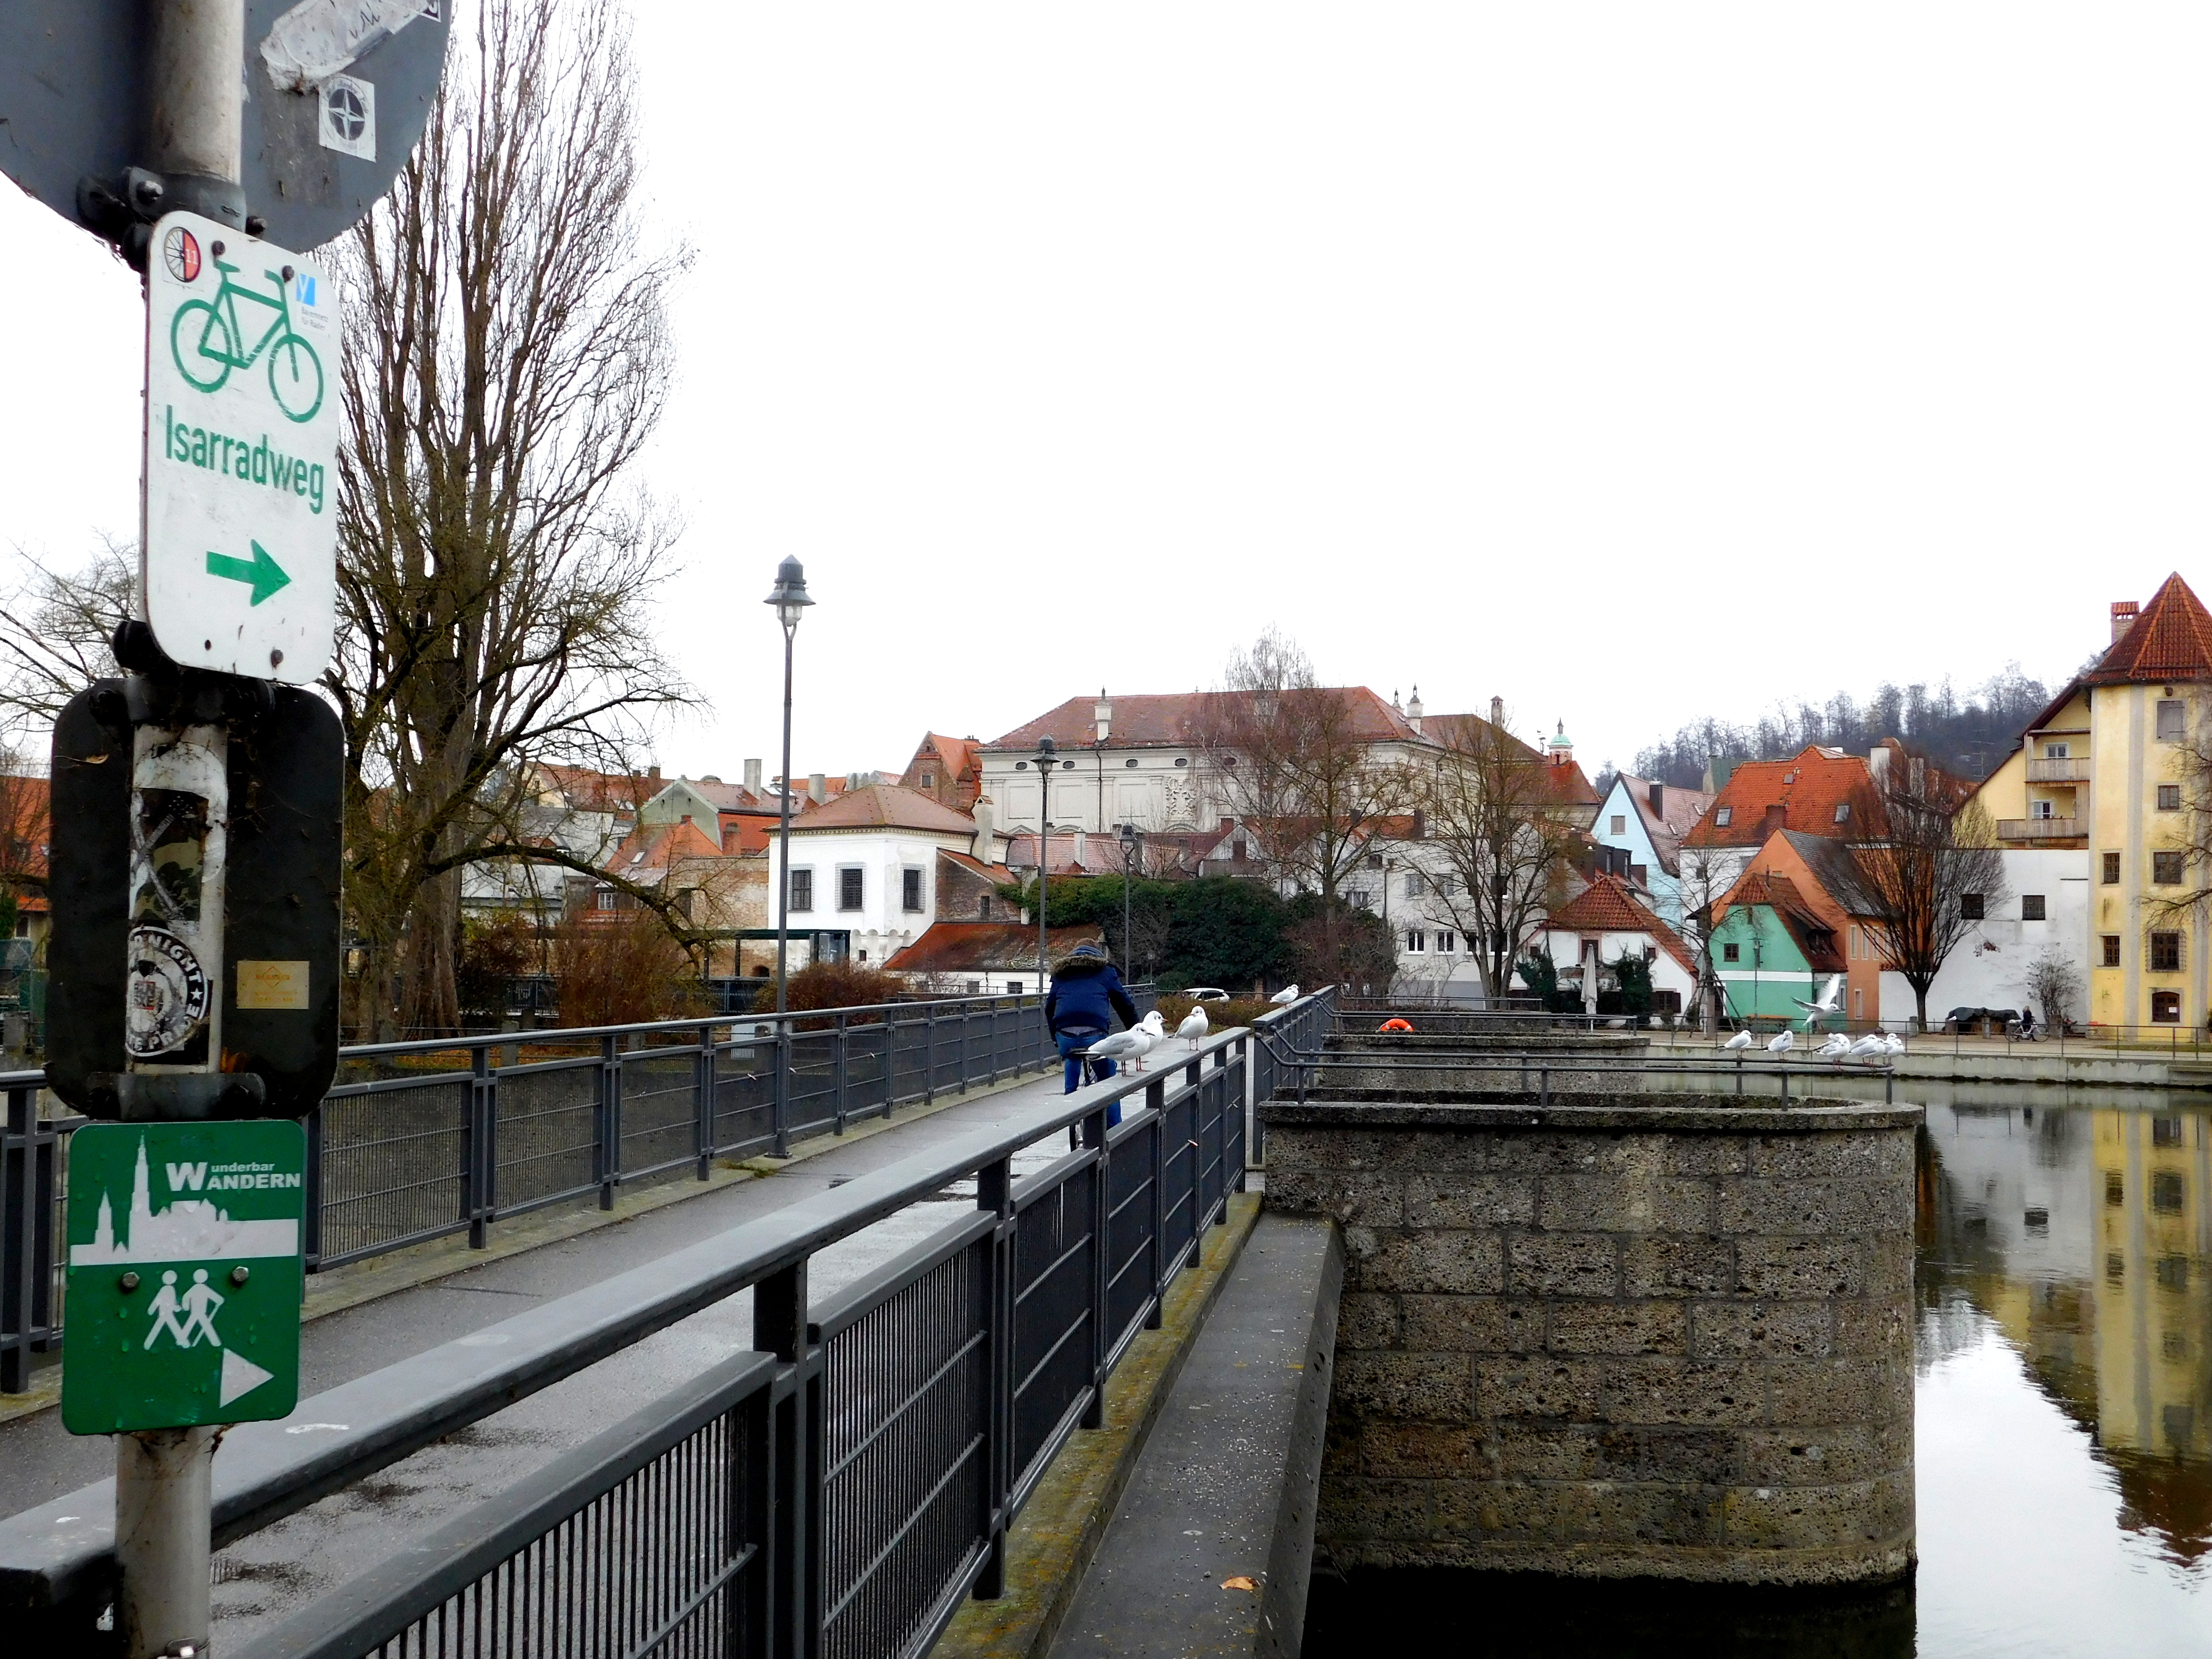 iulia ionescu in Landshut